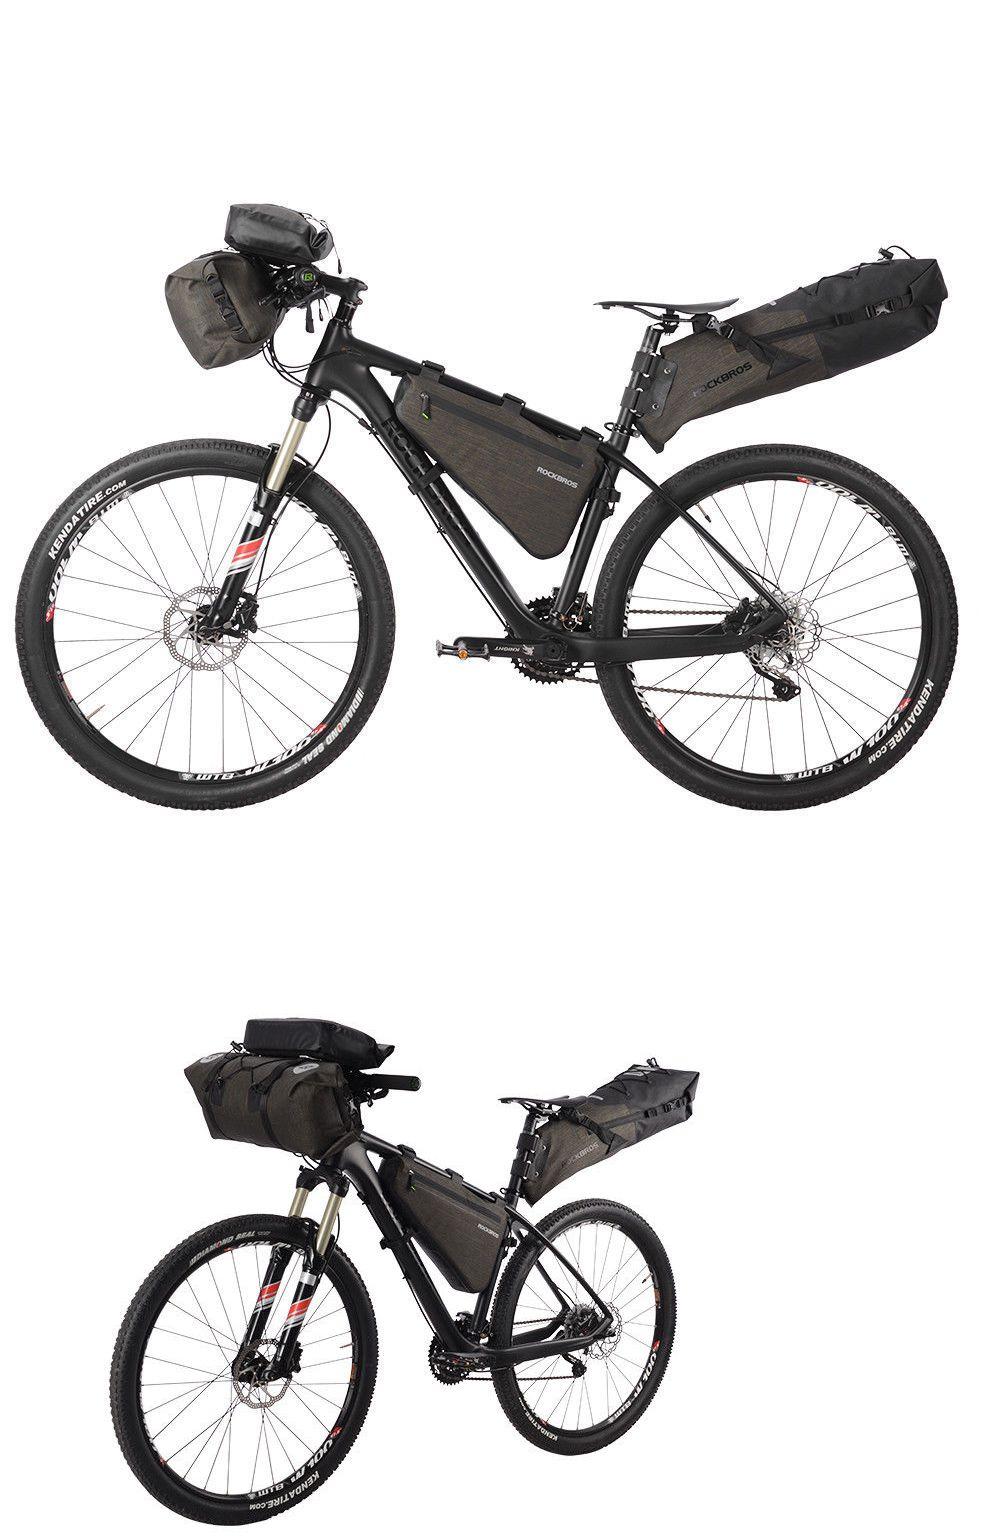 RockBros Bike Cycling Touring Combined Handlebar Frame Saddle Bag ...